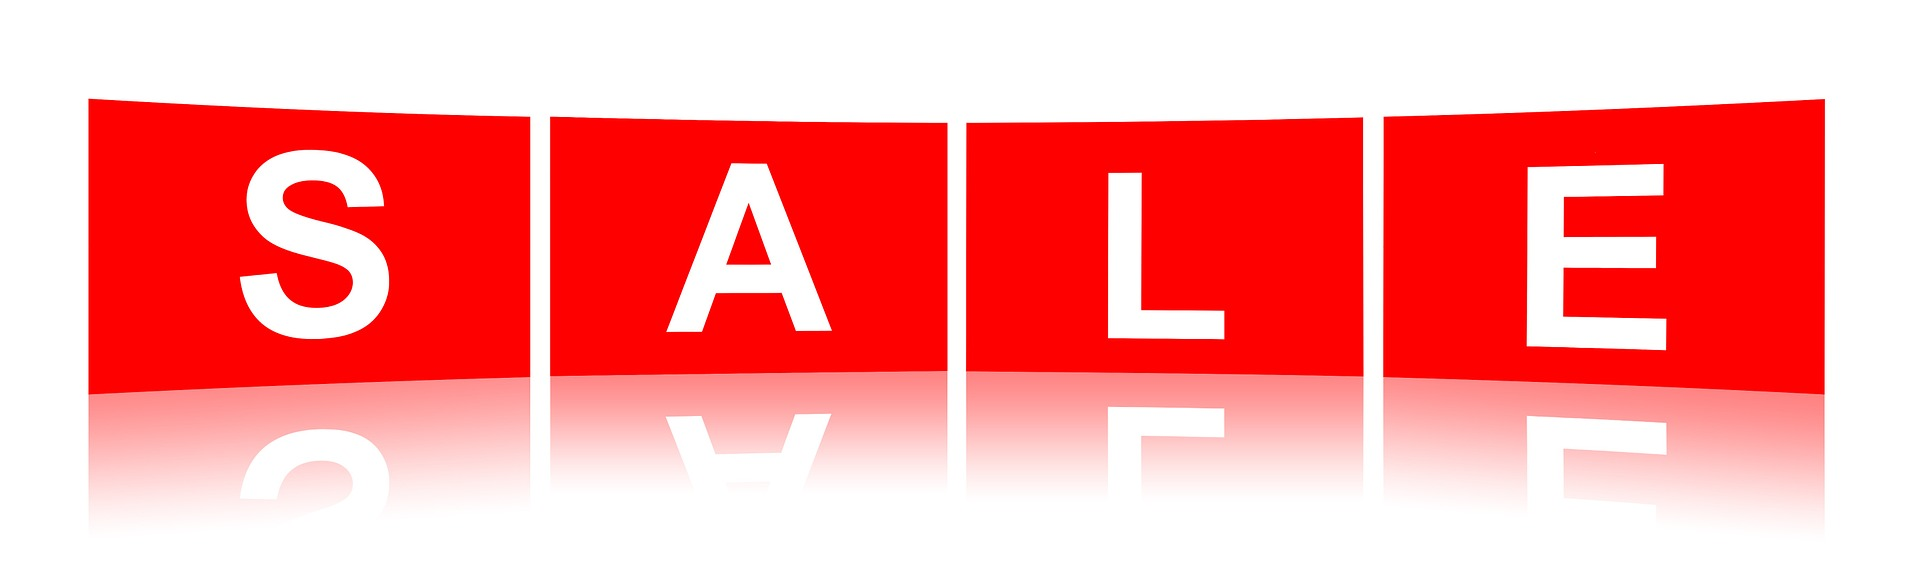 Discount season starts again 15.01!- 20 % for all cars!!